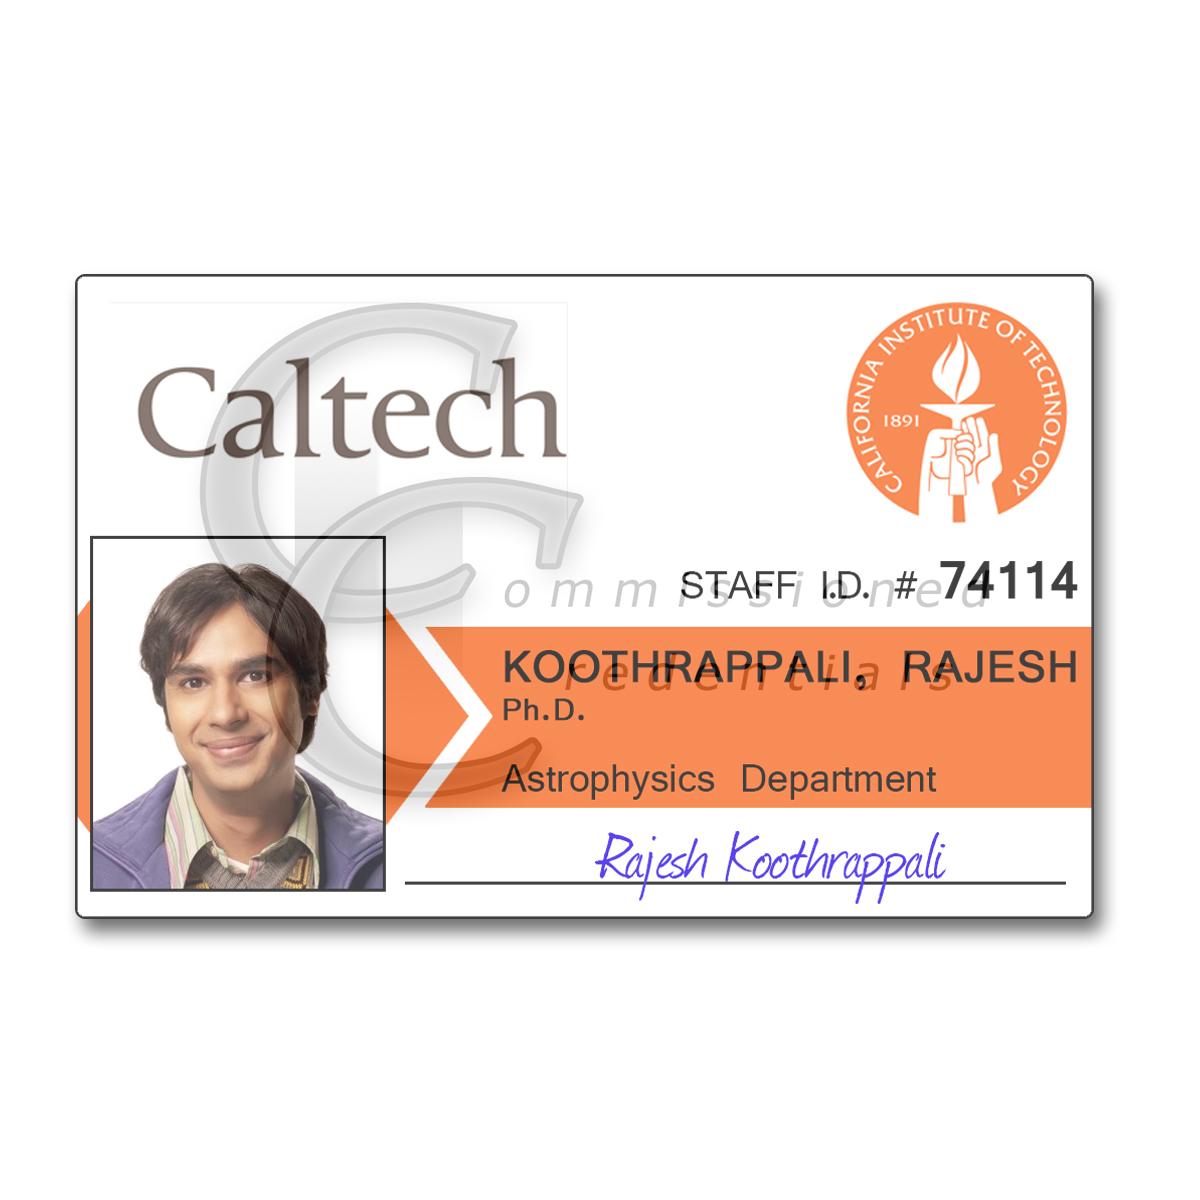 Rajesh Koothrappali Astrophysics Dept The Big Bang Theory ID Badge-Caltech Dr